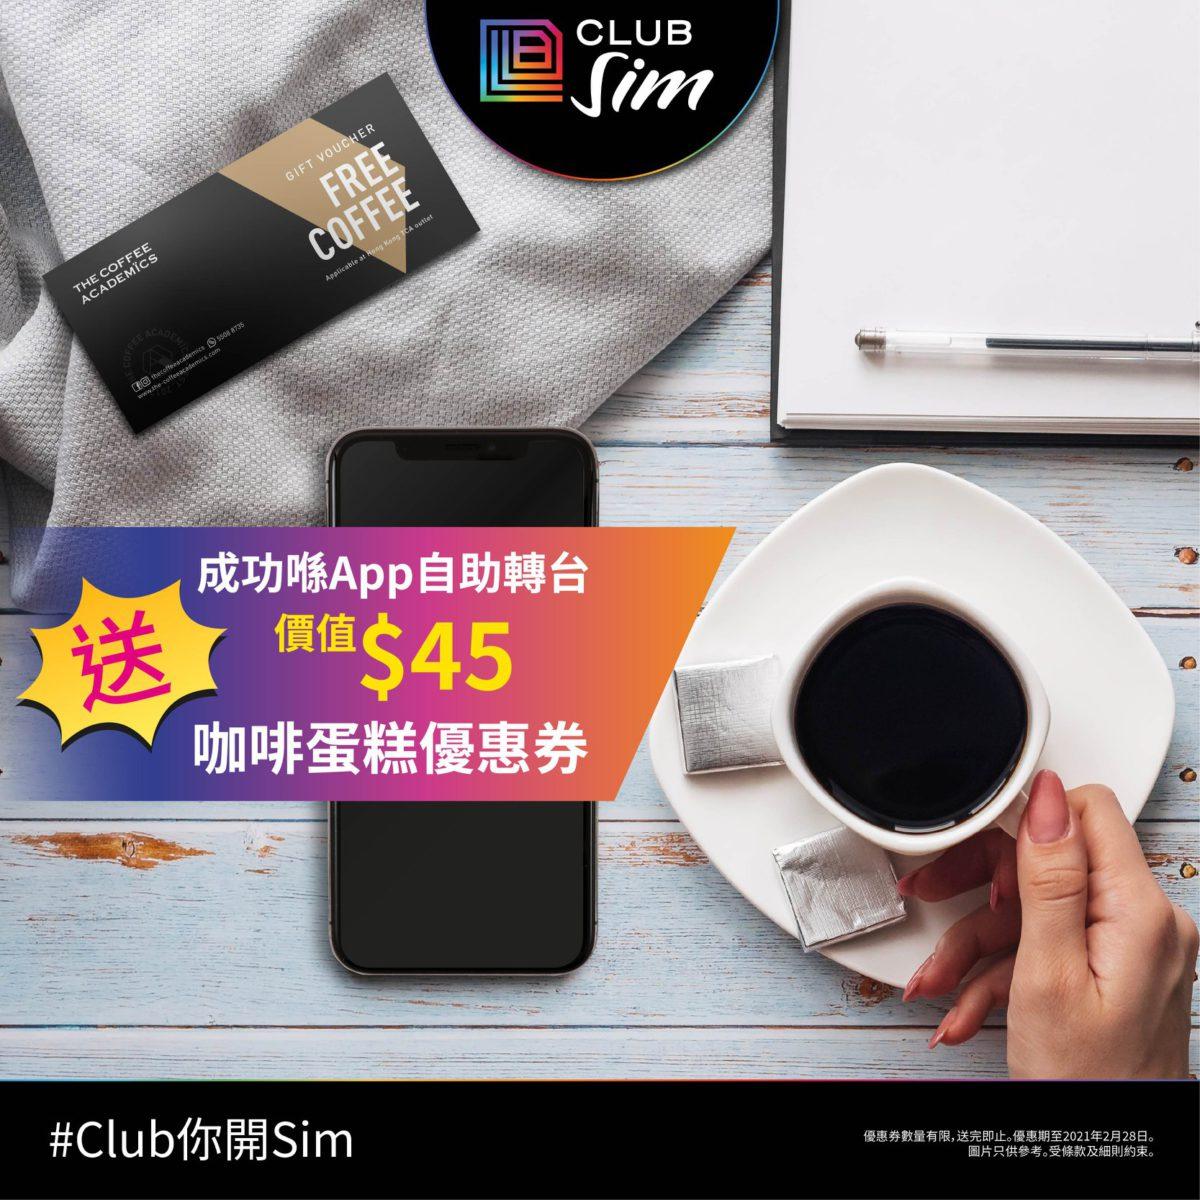 Club Sim 轉頭送 6GB 及咖啡